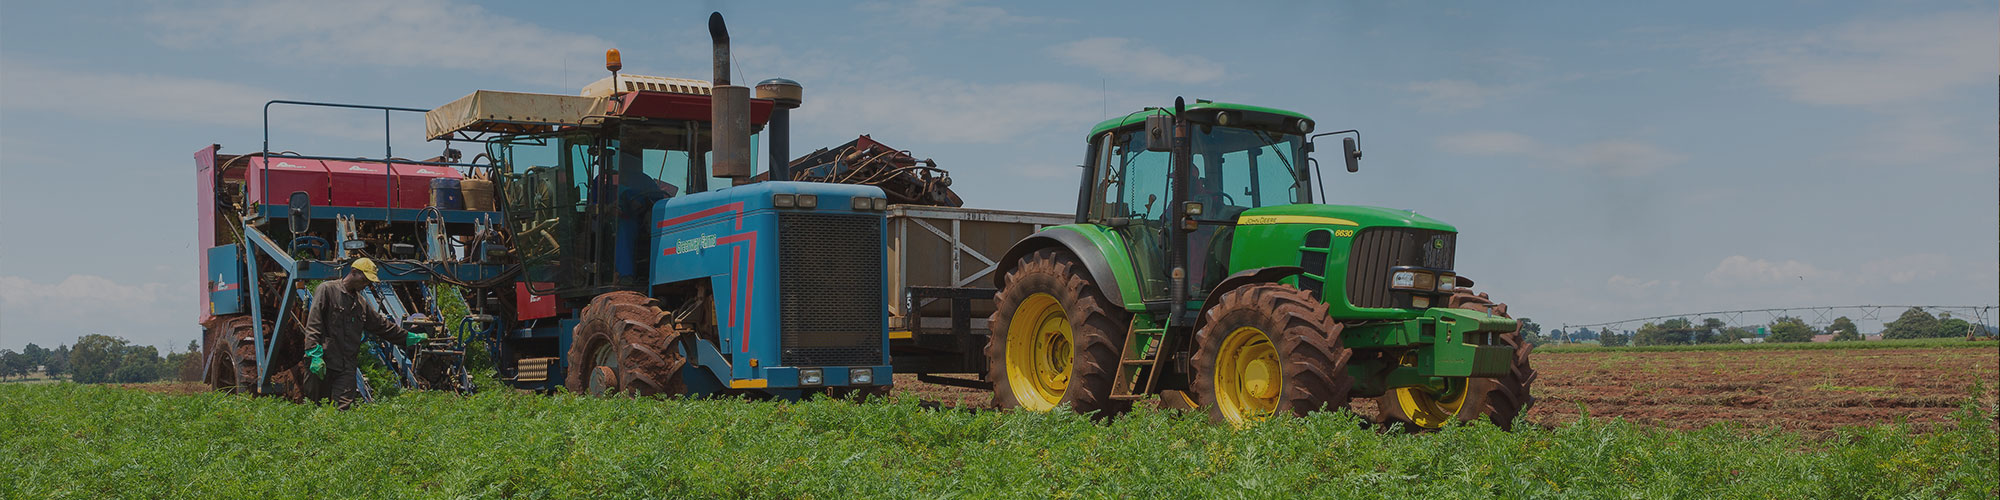 Harvesting tractors